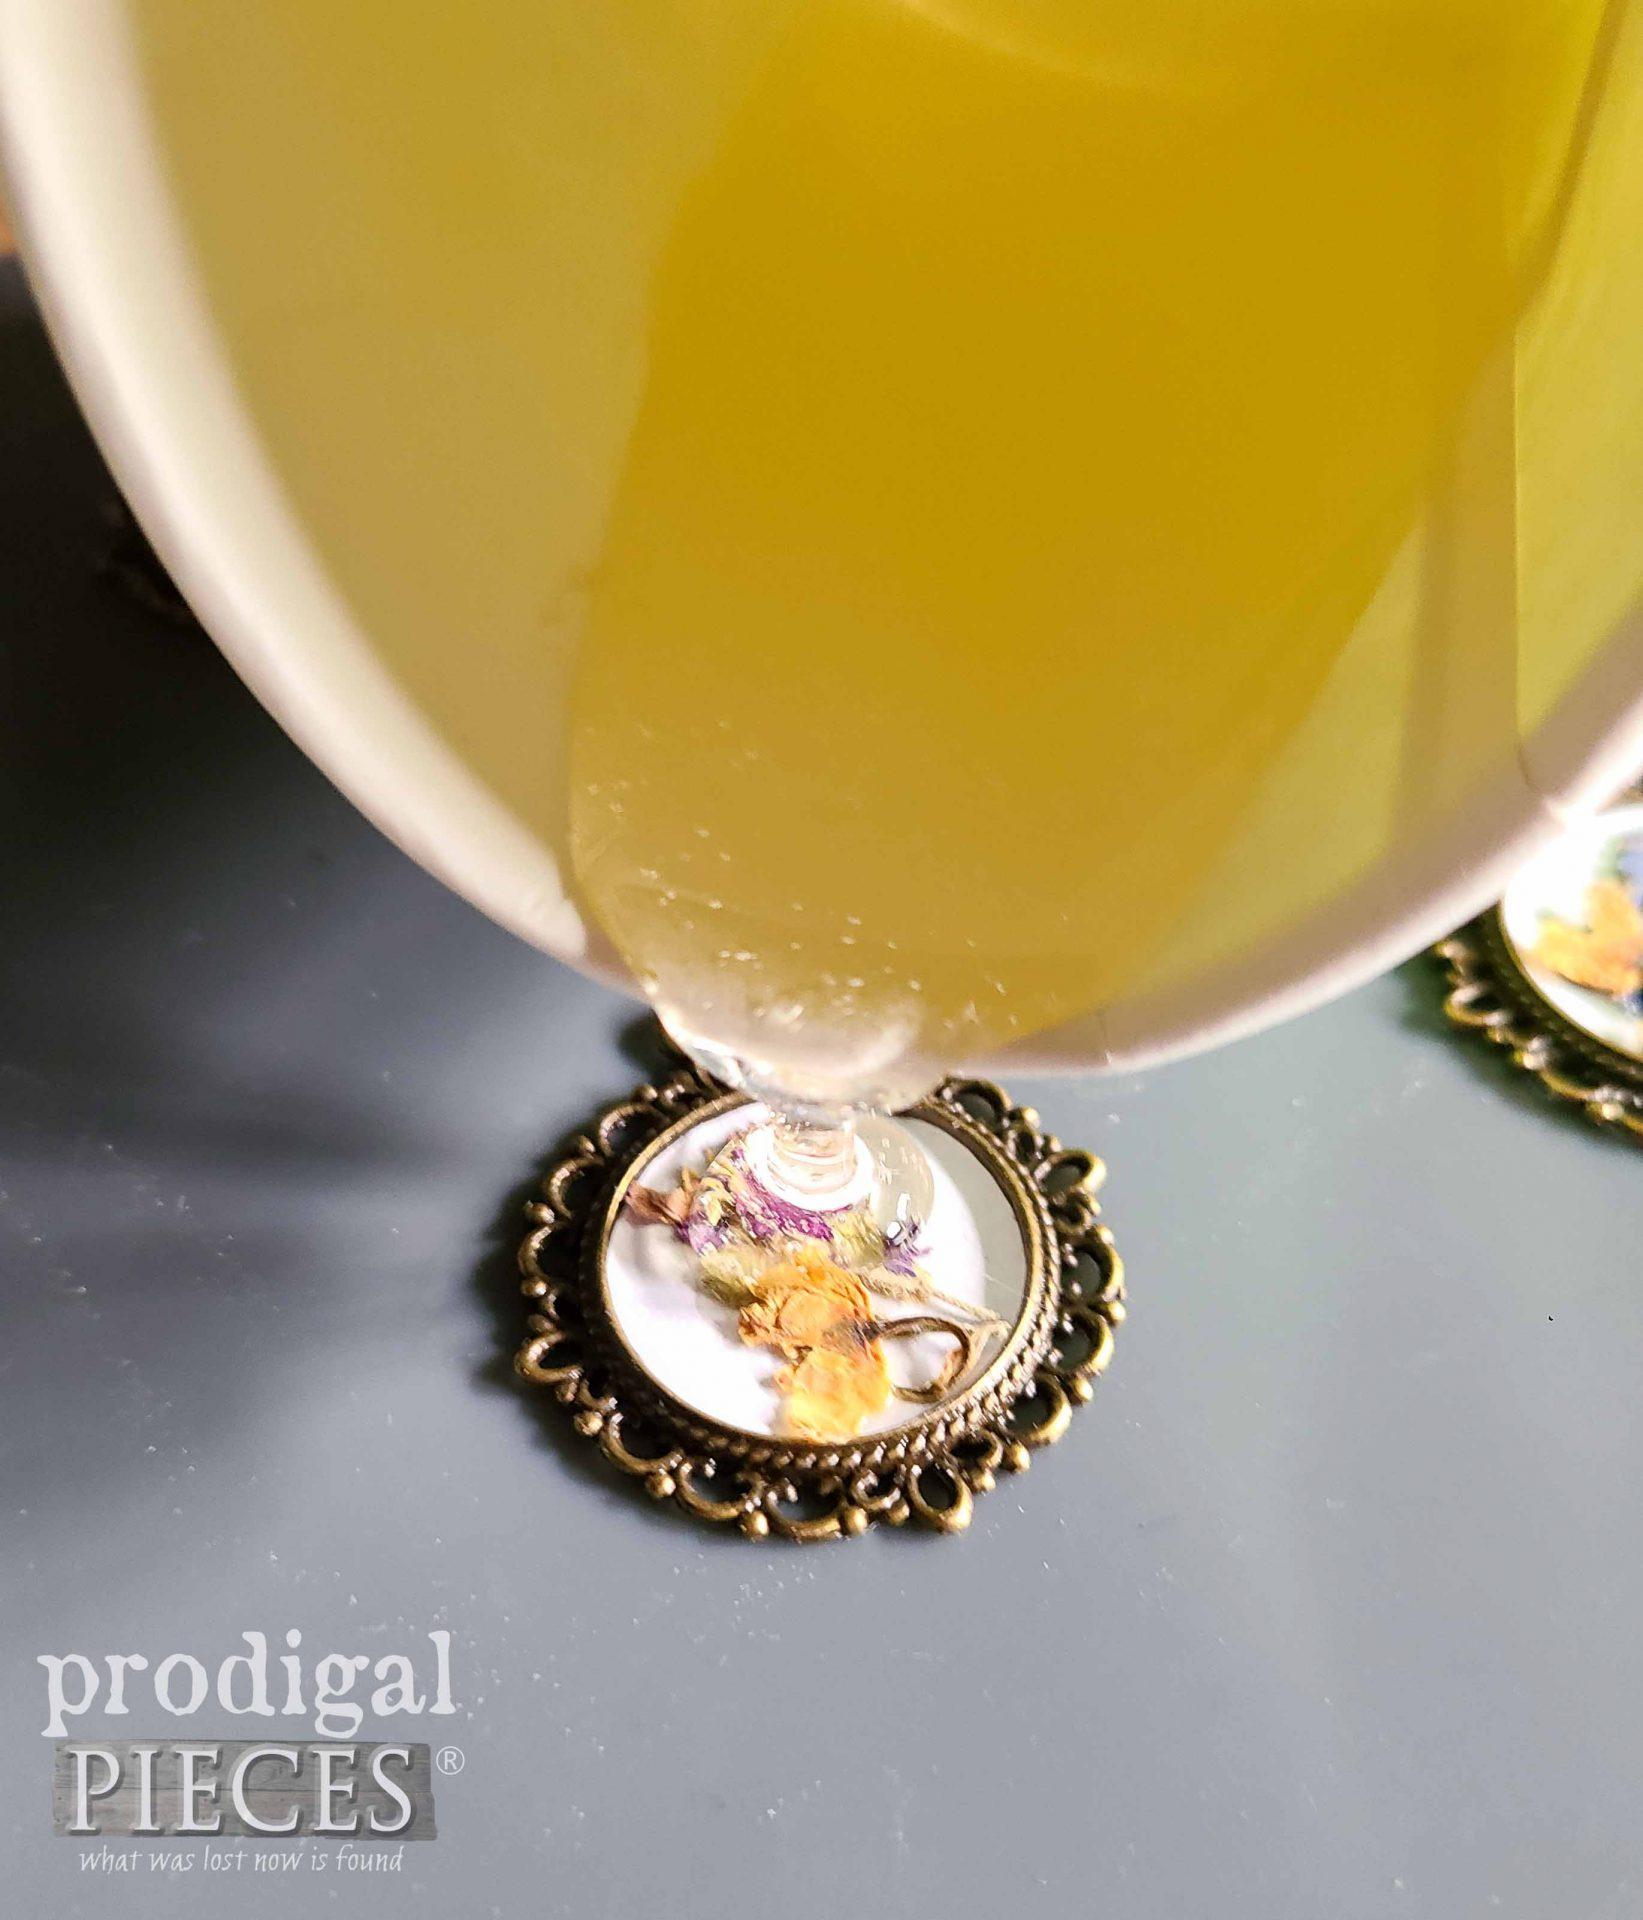 Pouring Epoxy Resin into Jewelry Bezel   prodigalpieces.com